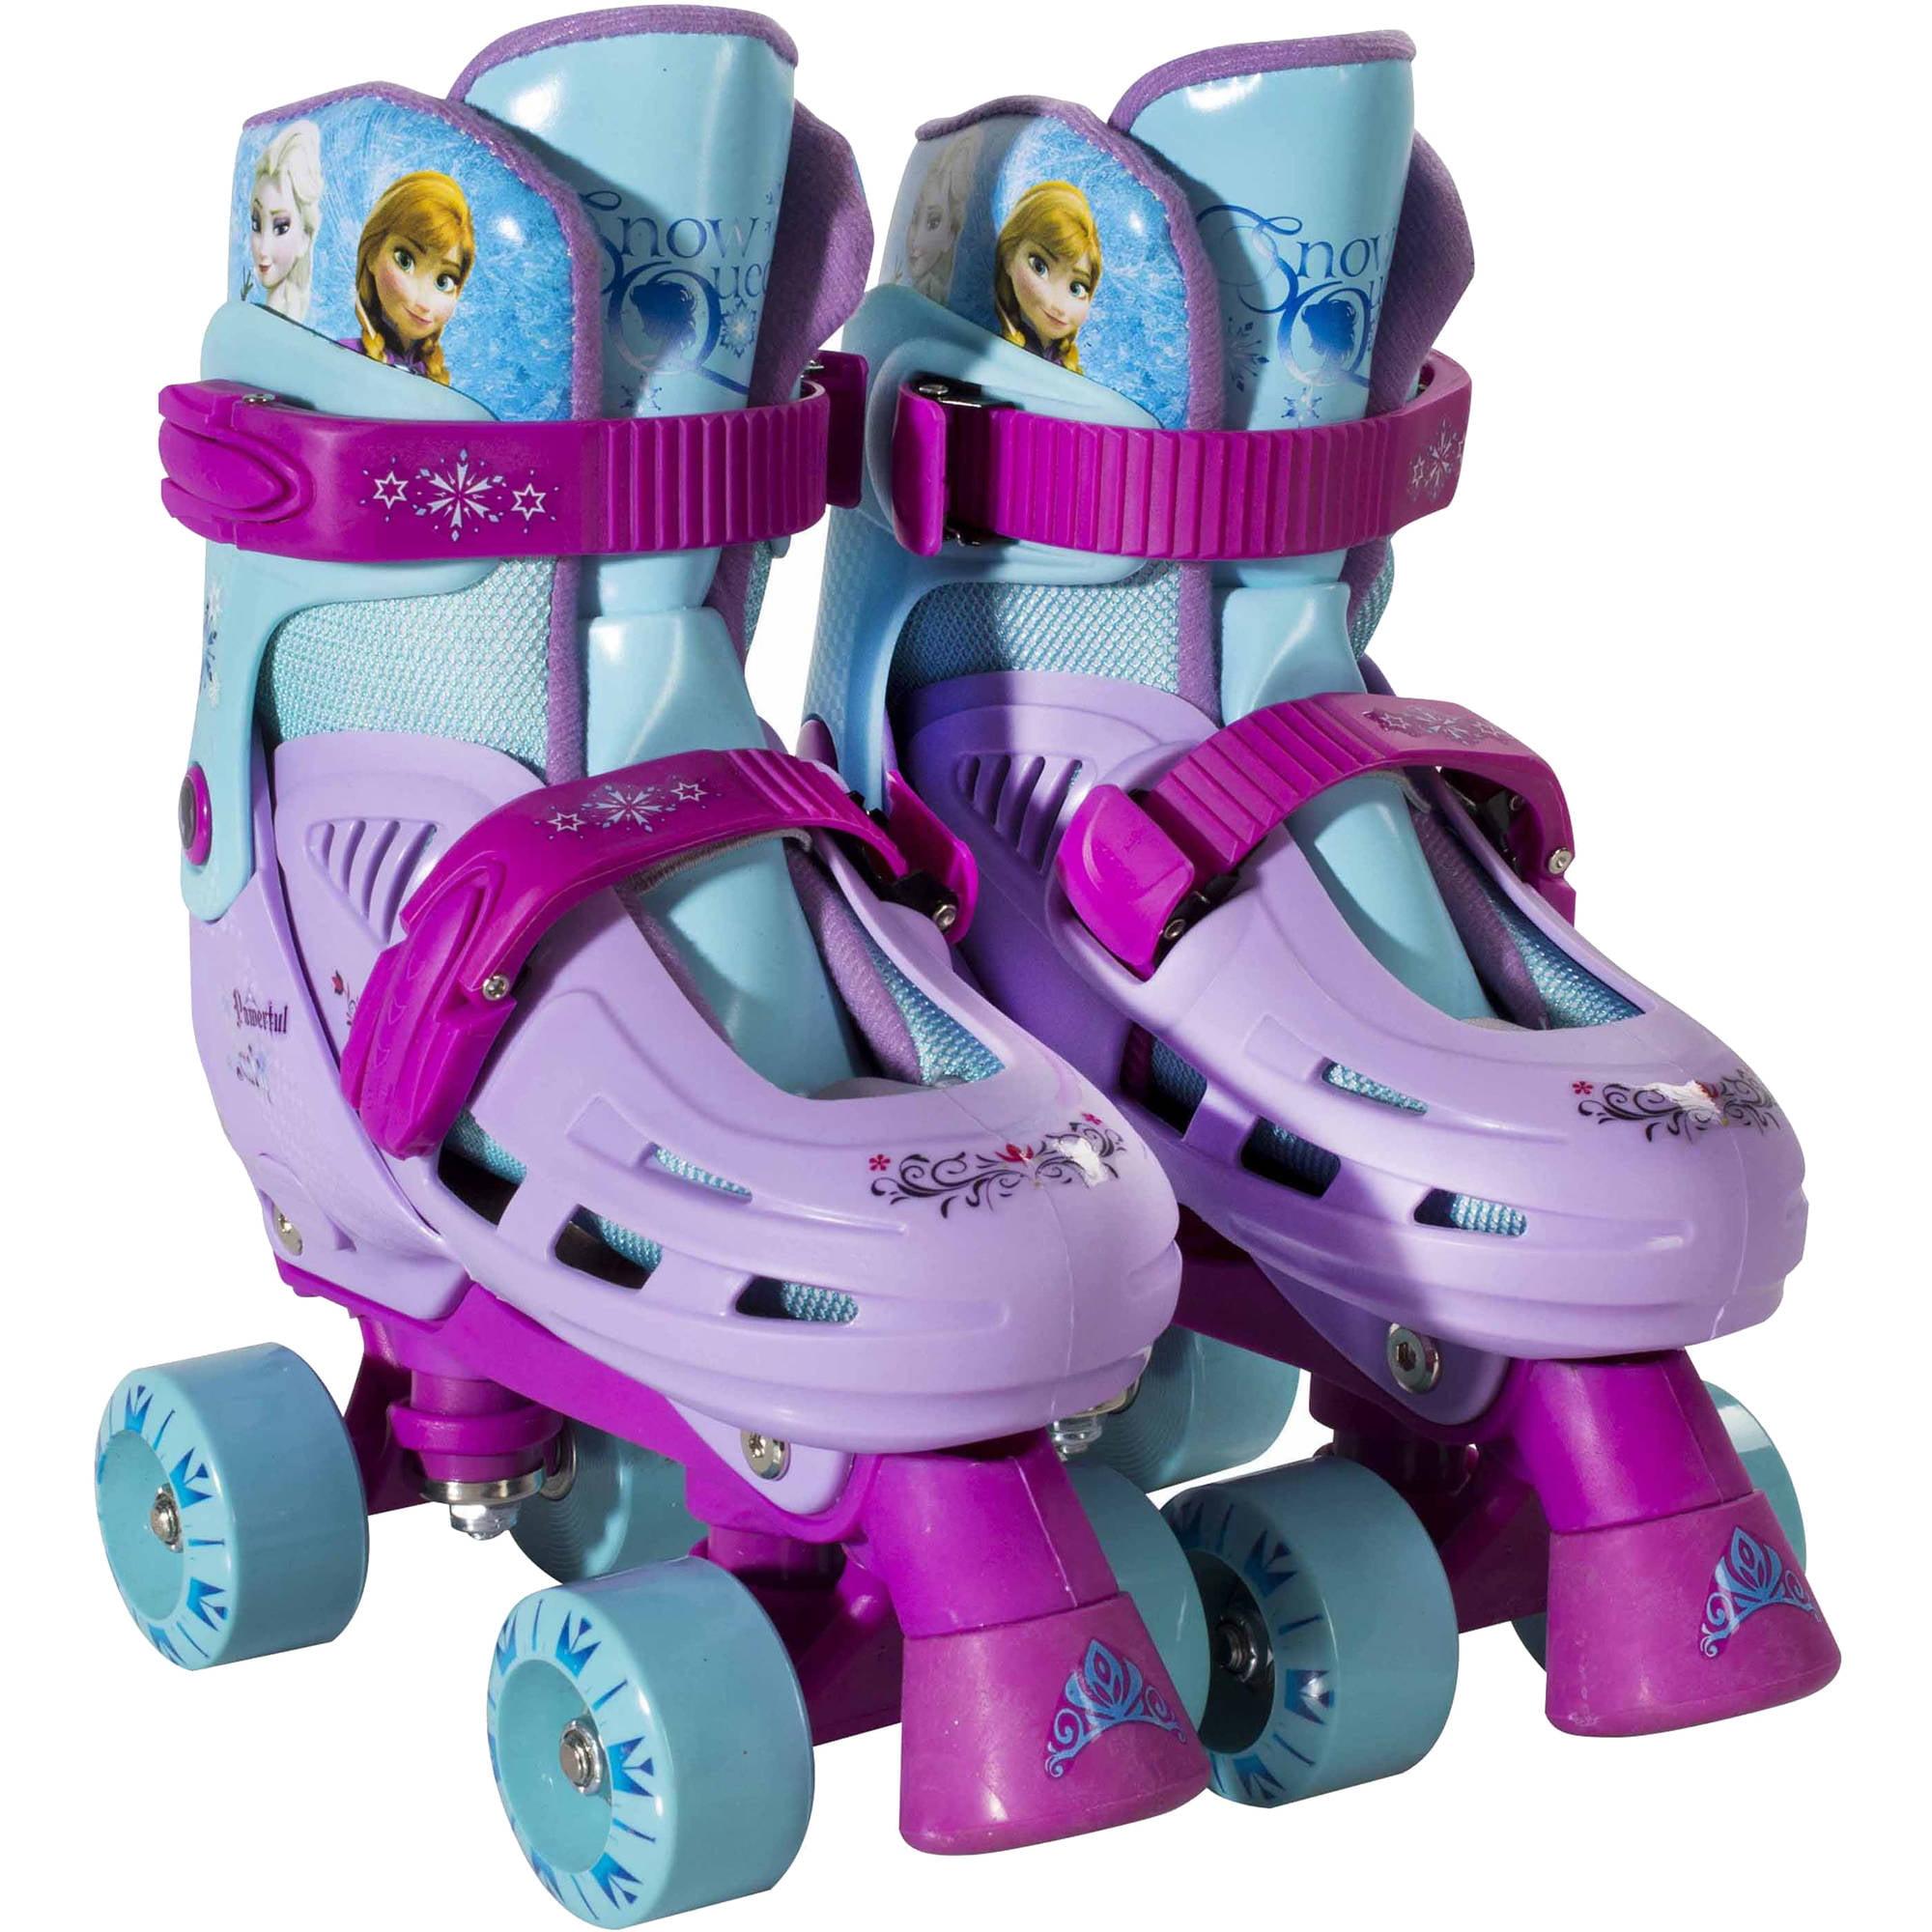 Roller skates for dogs - Playwheels Disney Frozen Kids Rollerskate Junior Size 1 4 Walmart Com